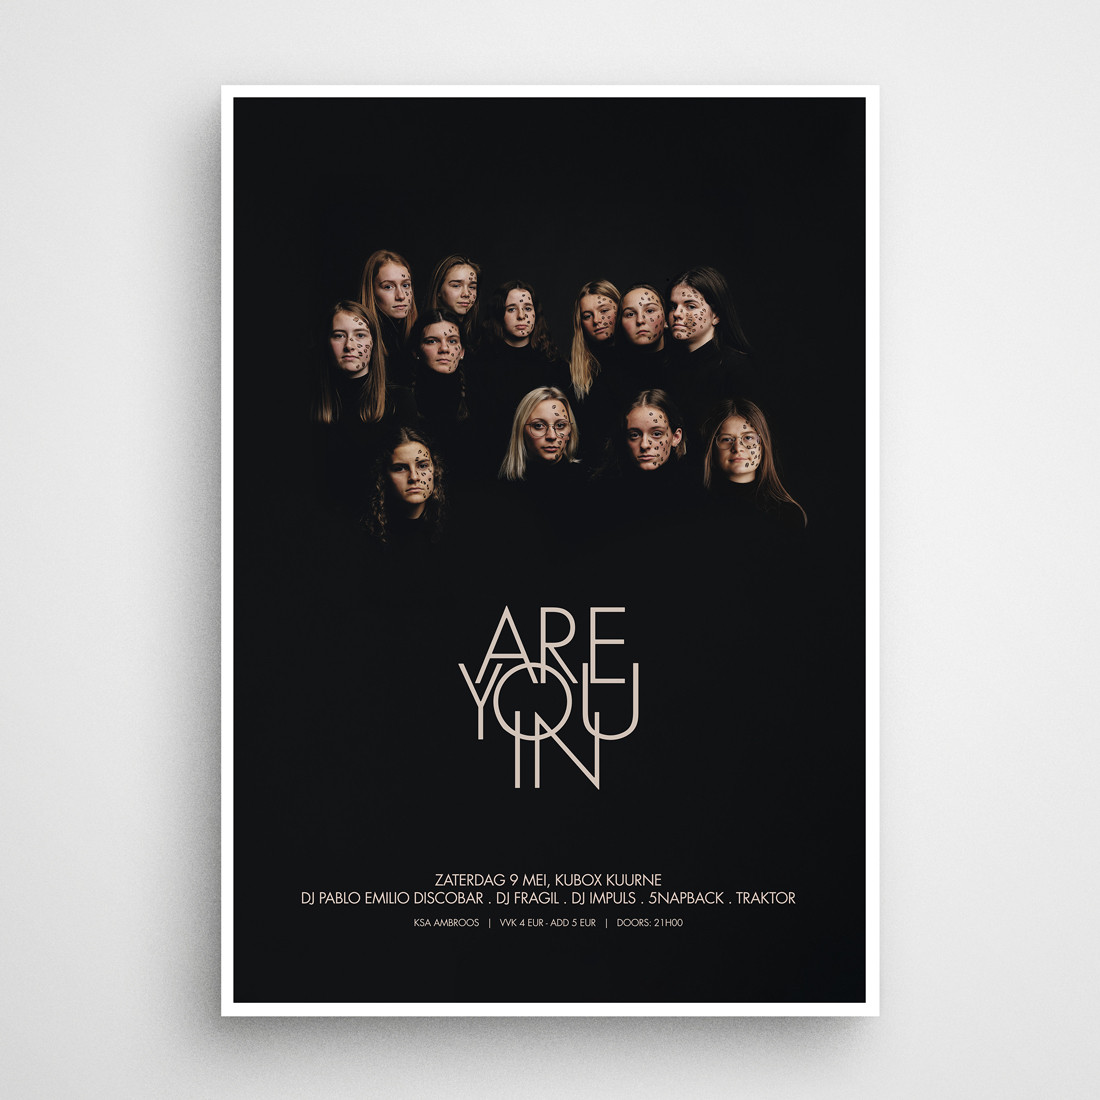 AYI_2020_Poster_01.jpg